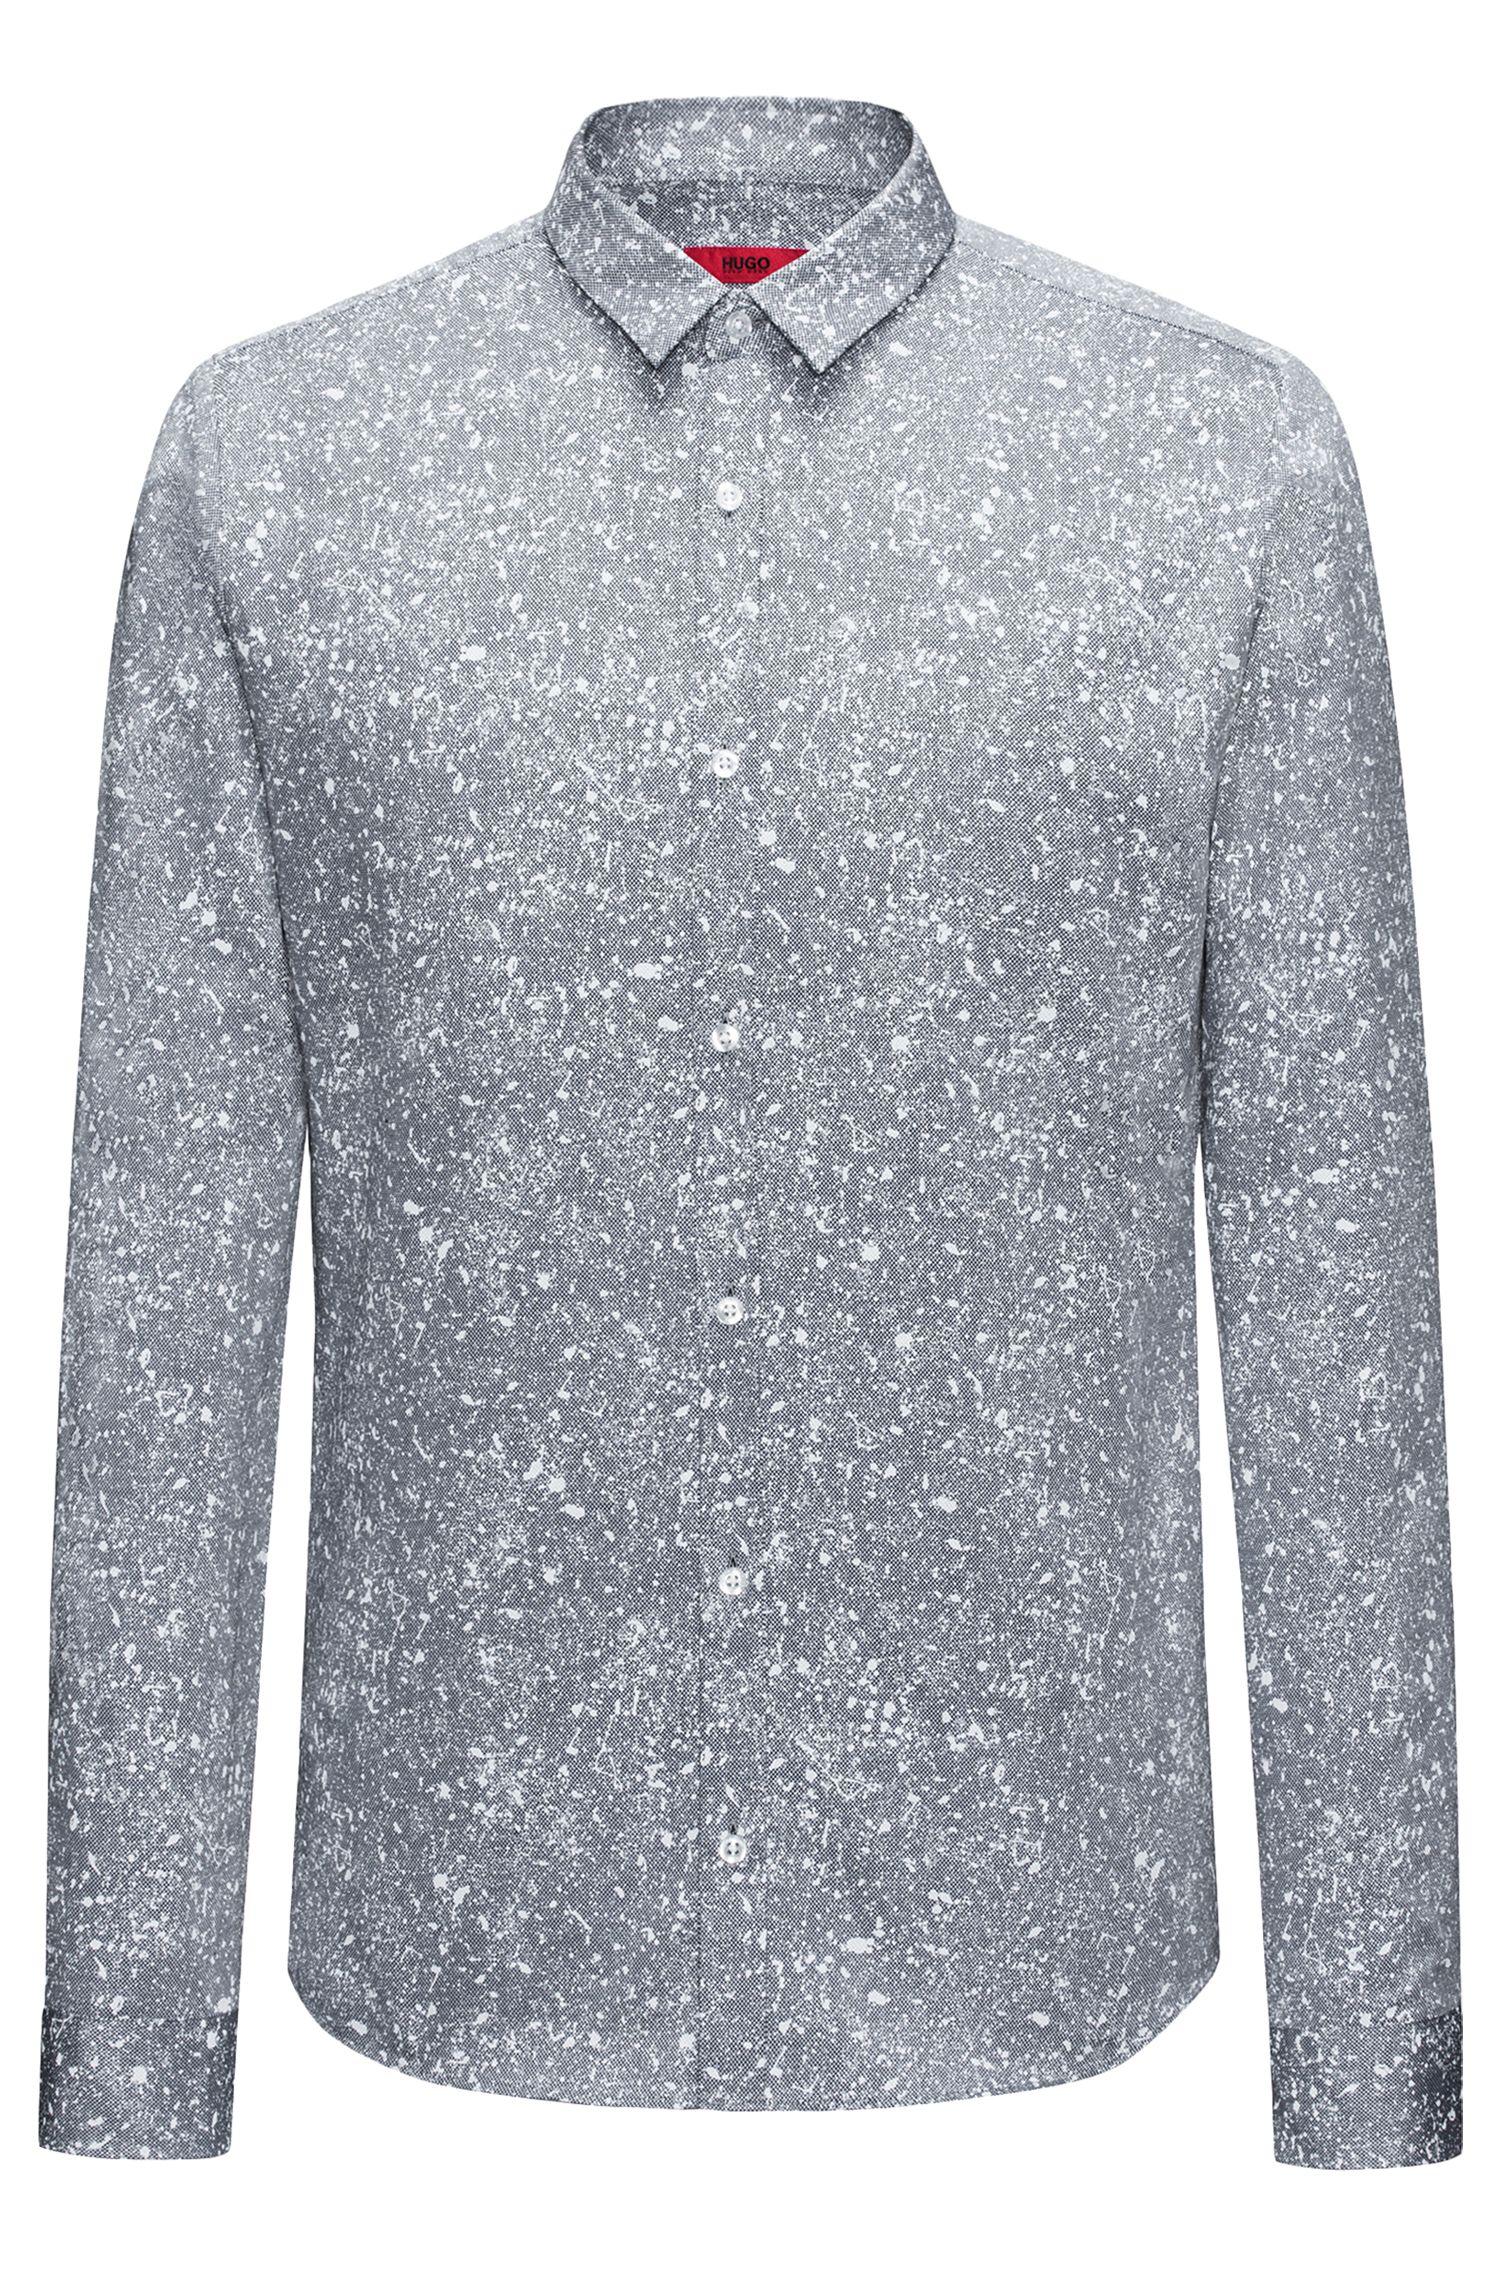 Paint-Splattered Cotton Shirt, Extra Slim Fit | Ero W